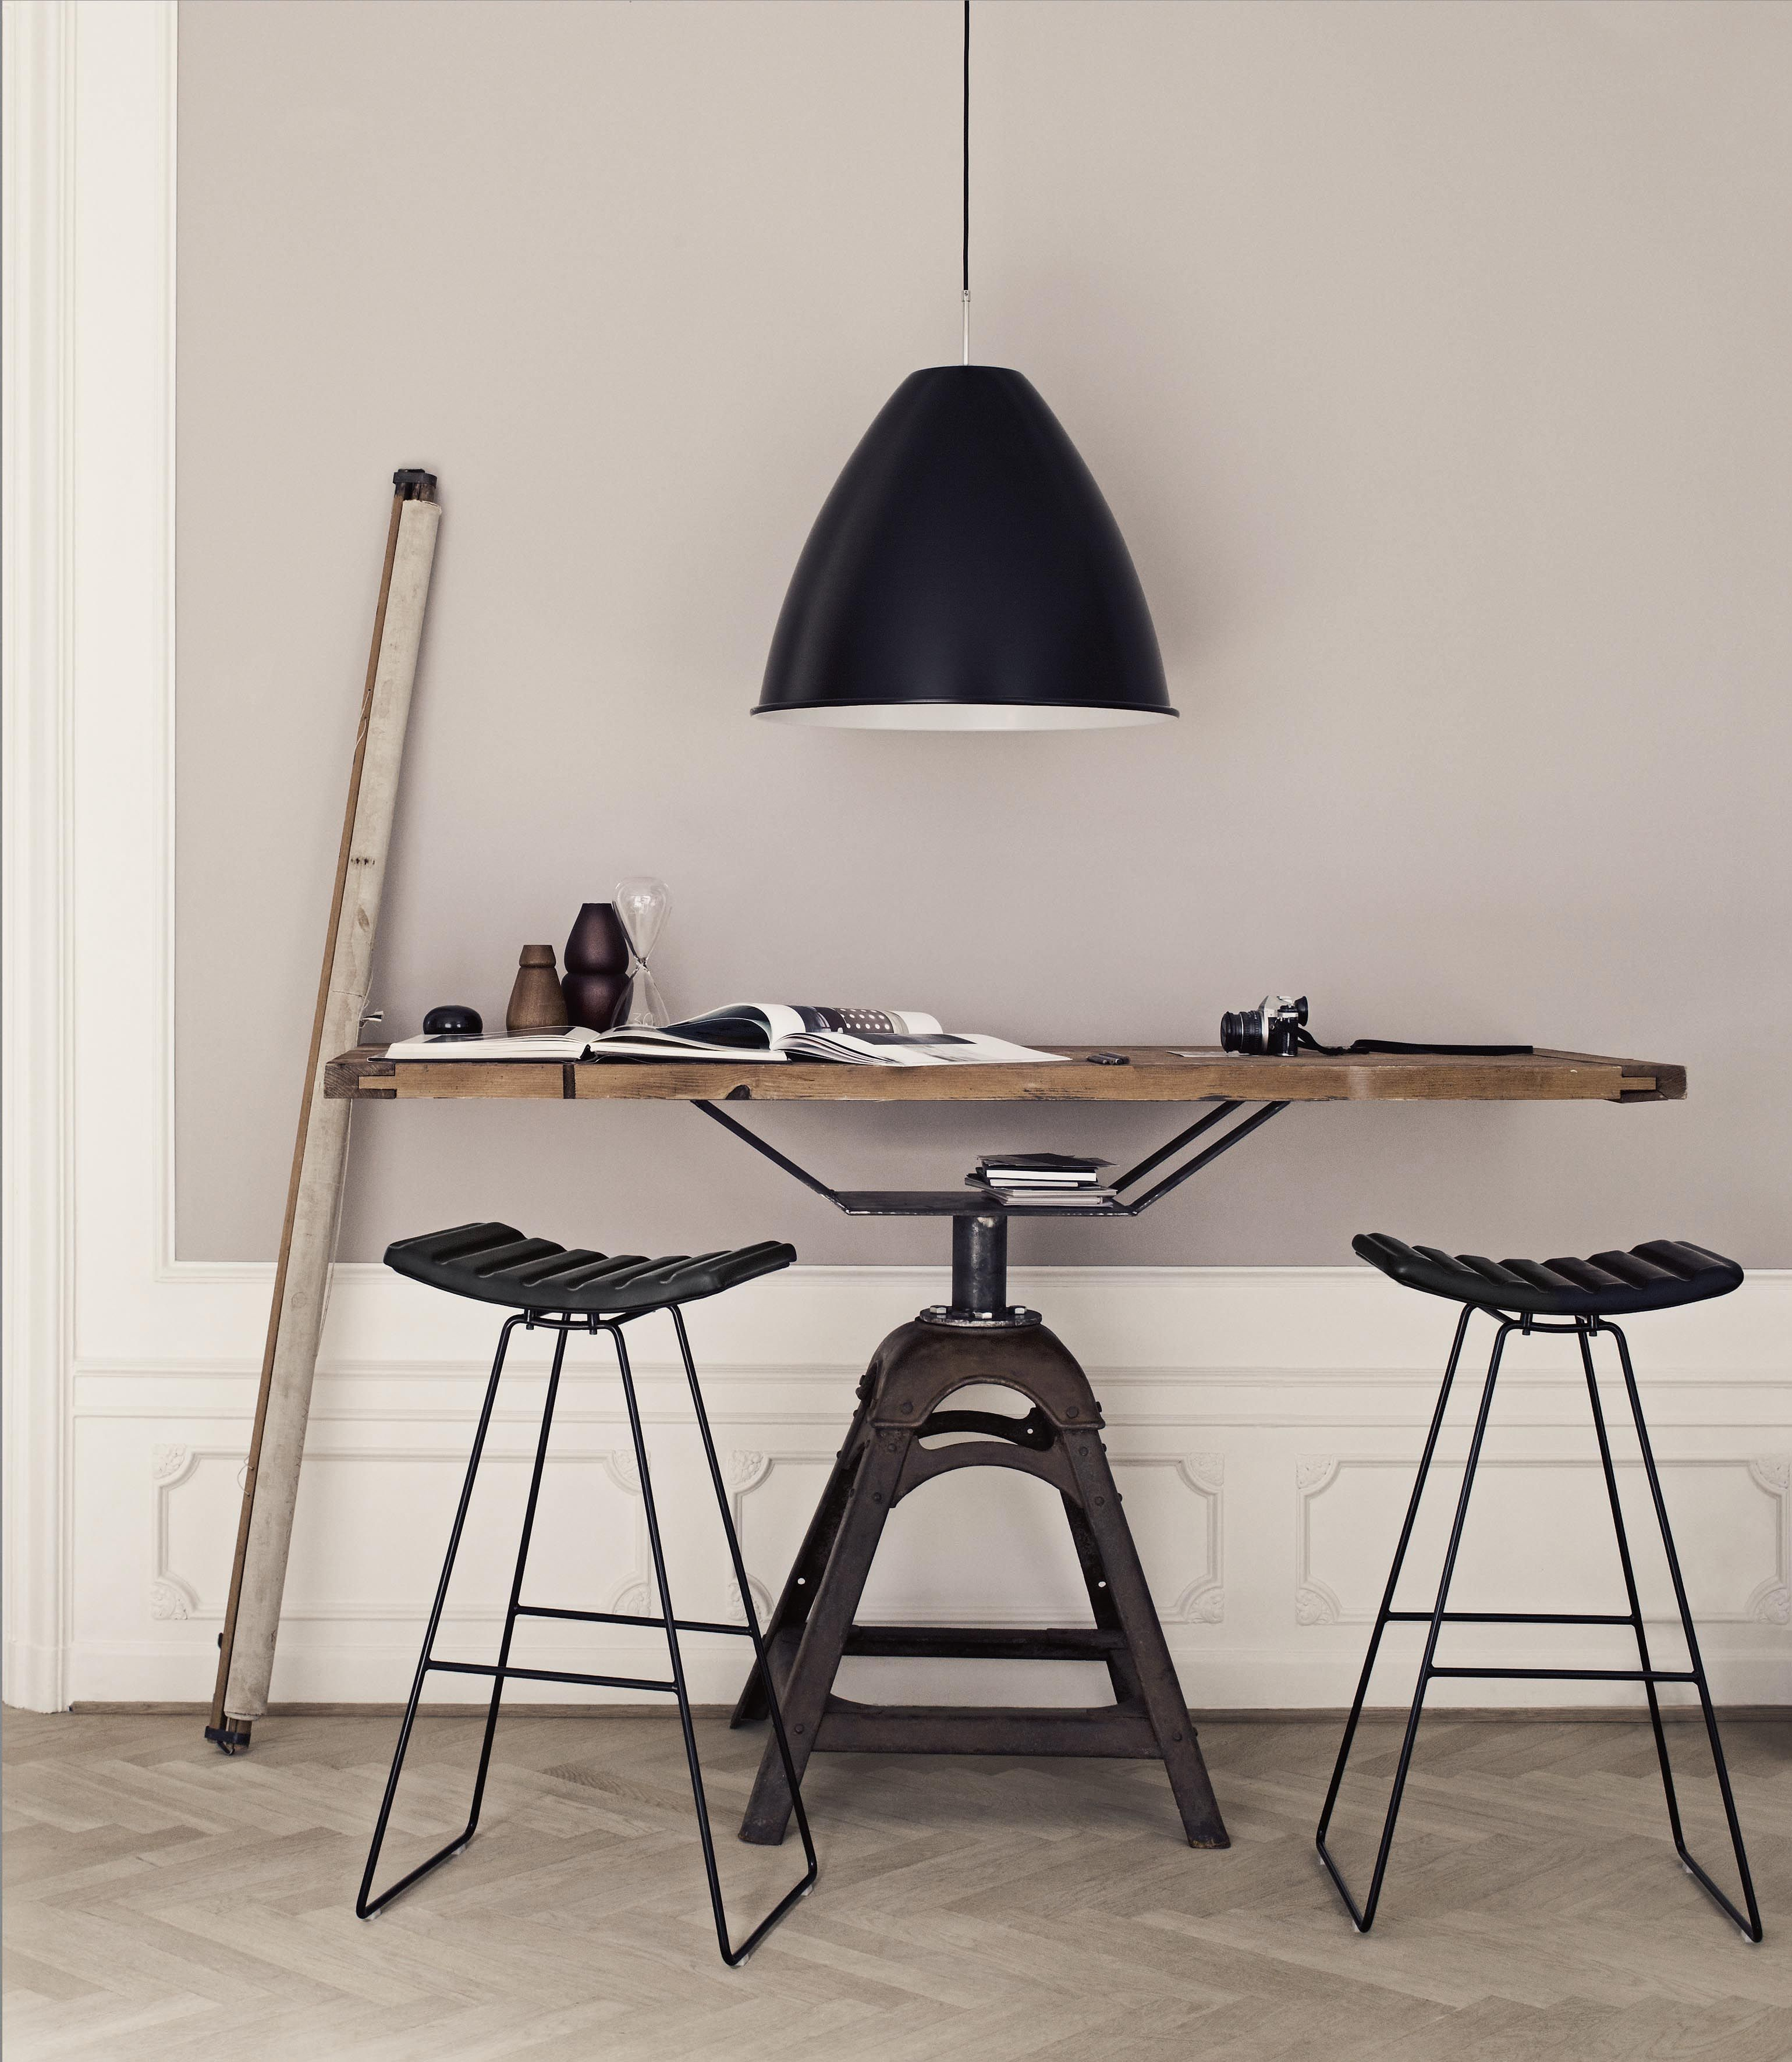 suspension industrielle gubi bestlite au dessus d 39 un bureau. Black Bedroom Furniture Sets. Home Design Ideas